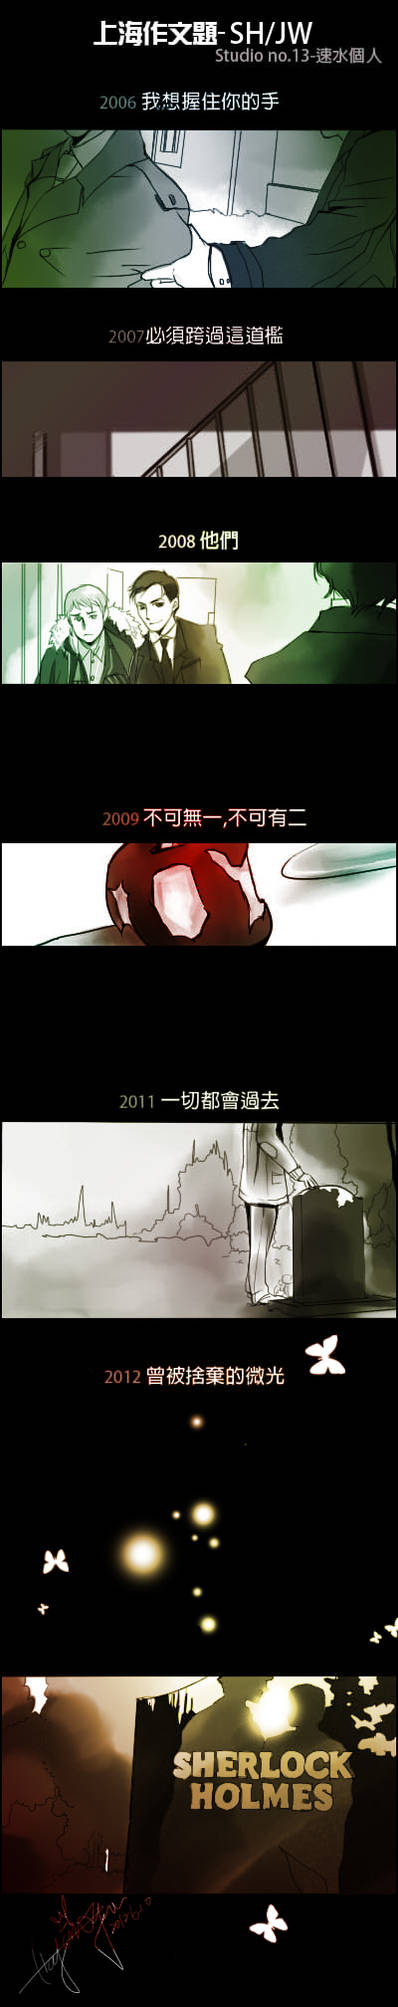 A story-(S.H./J.W.)